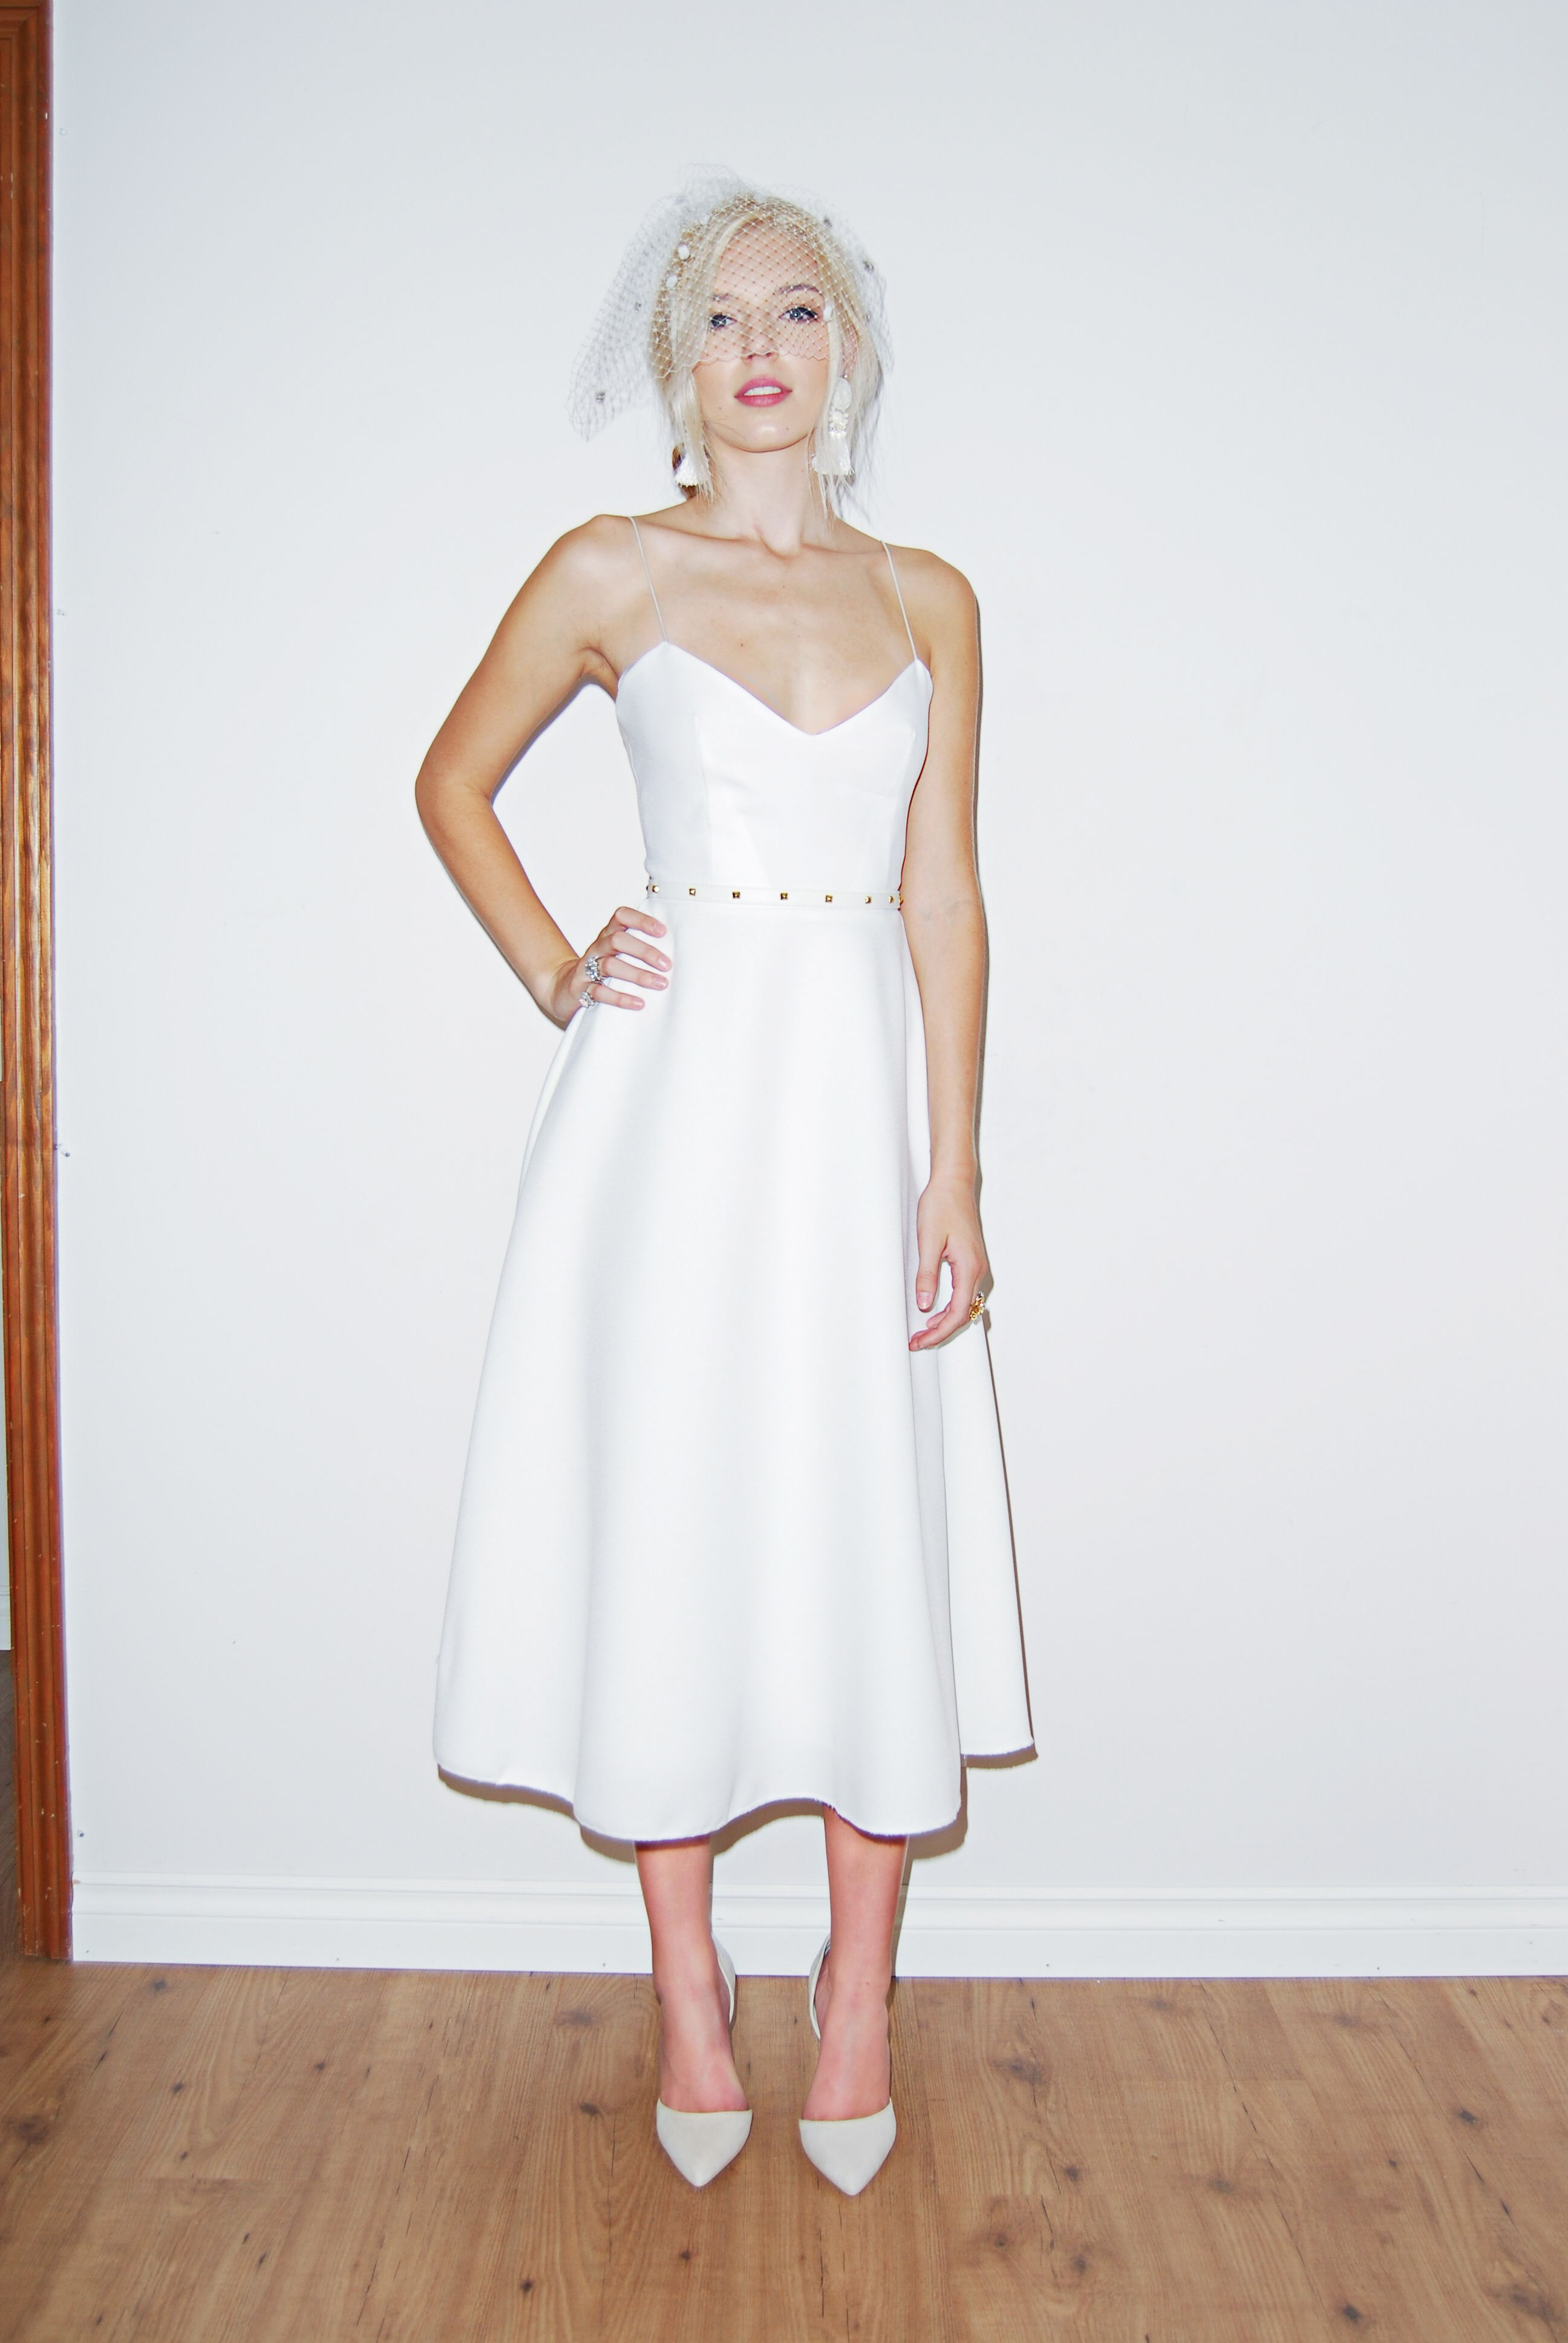 Sugar Tea Dress 2016 Sunjin Lee Bridal Collection Now